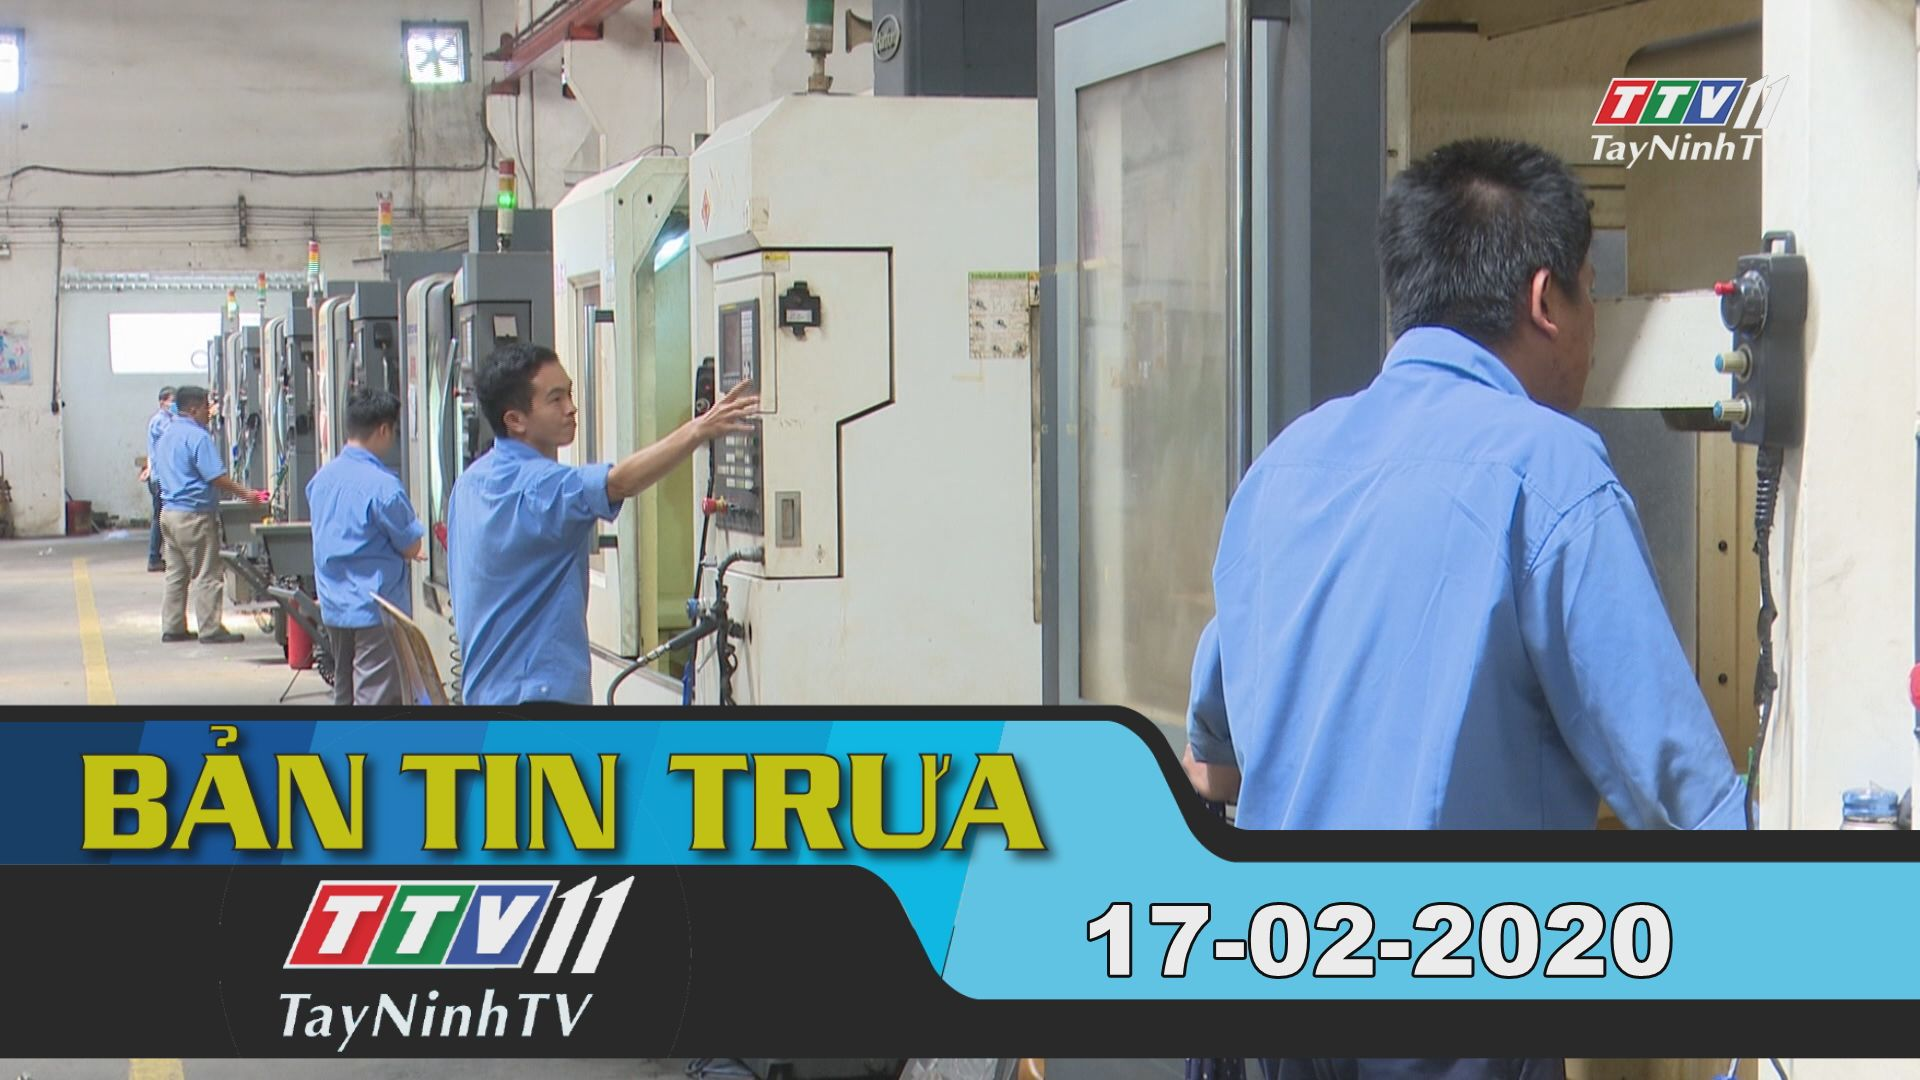 Bản tin trưa 17-02-2020 | Tin tức hôm nay | TayNinhTV